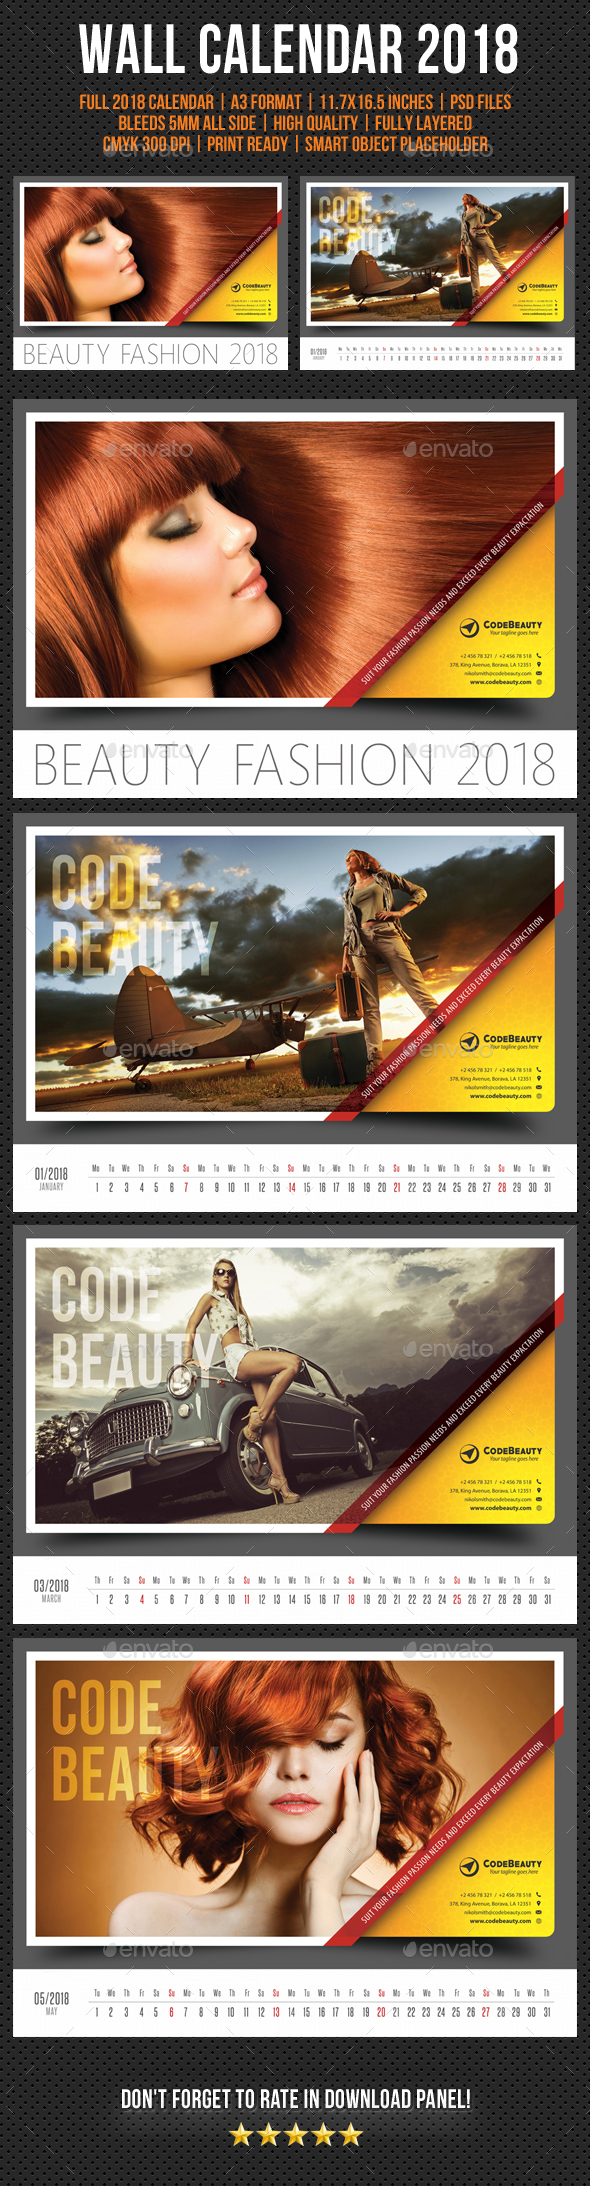 Wall Calendar 2018 V12 - Calendars Stationery